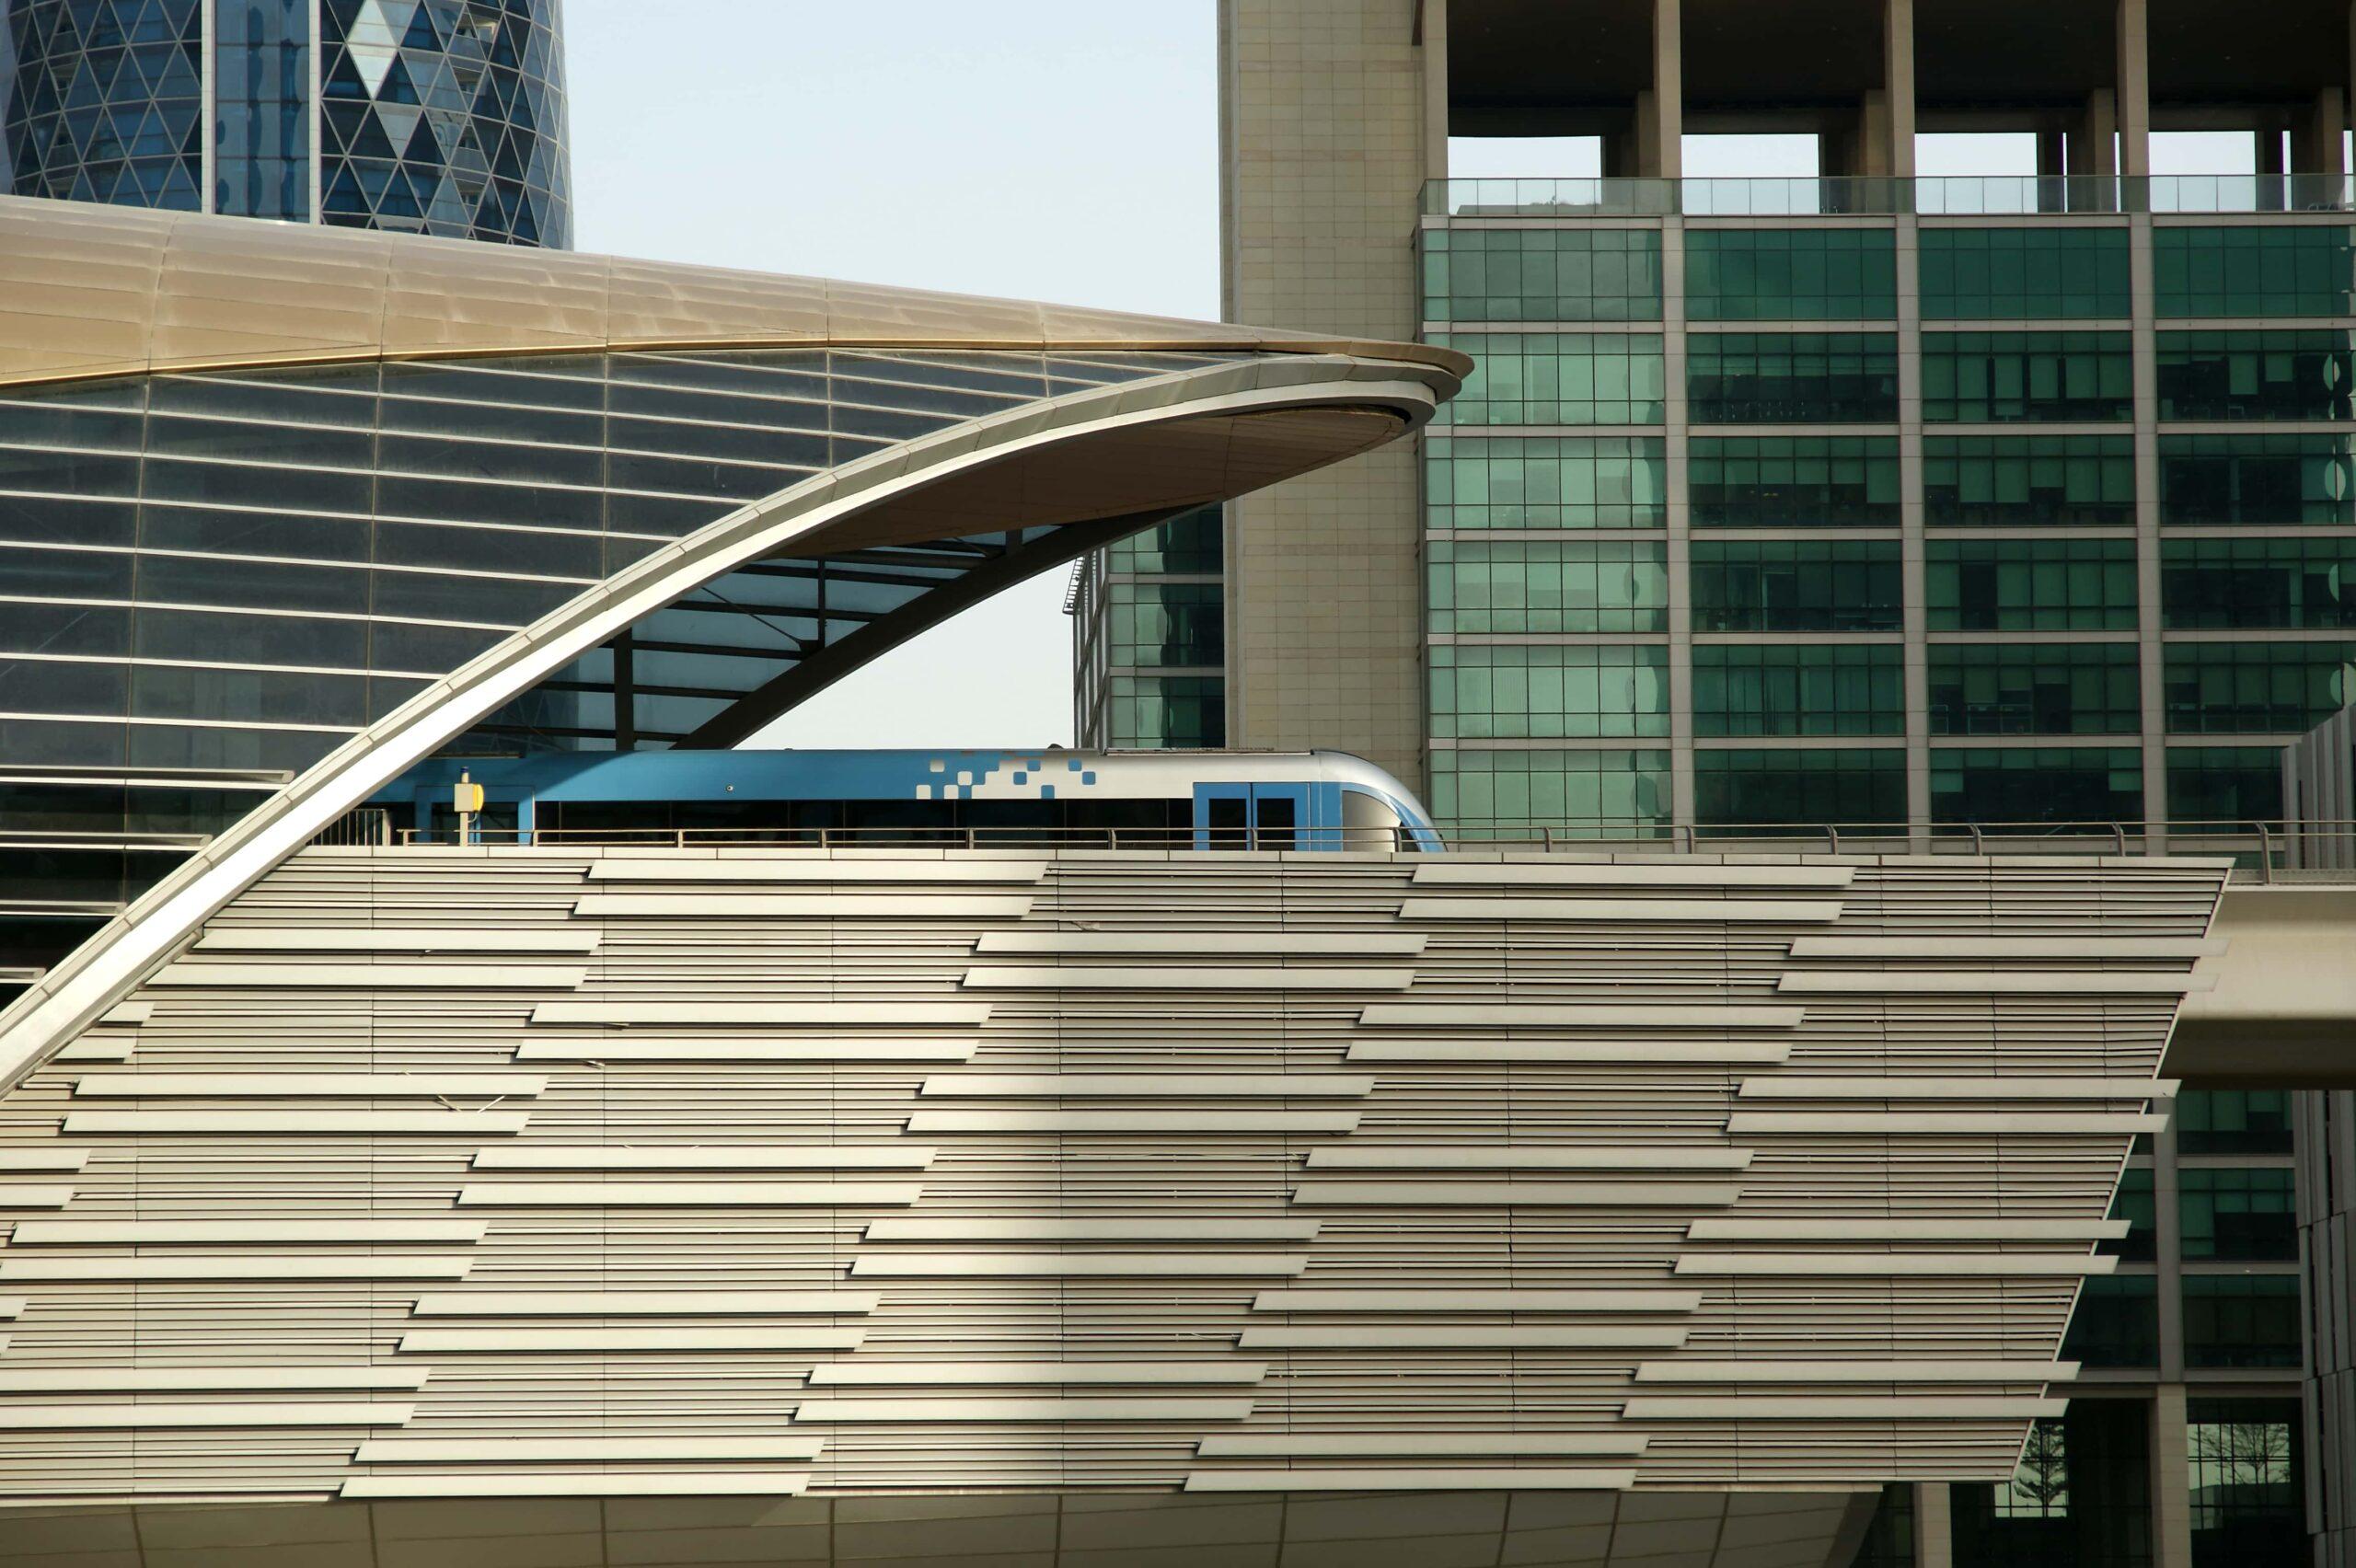 Dubai Metro station with a car leaving